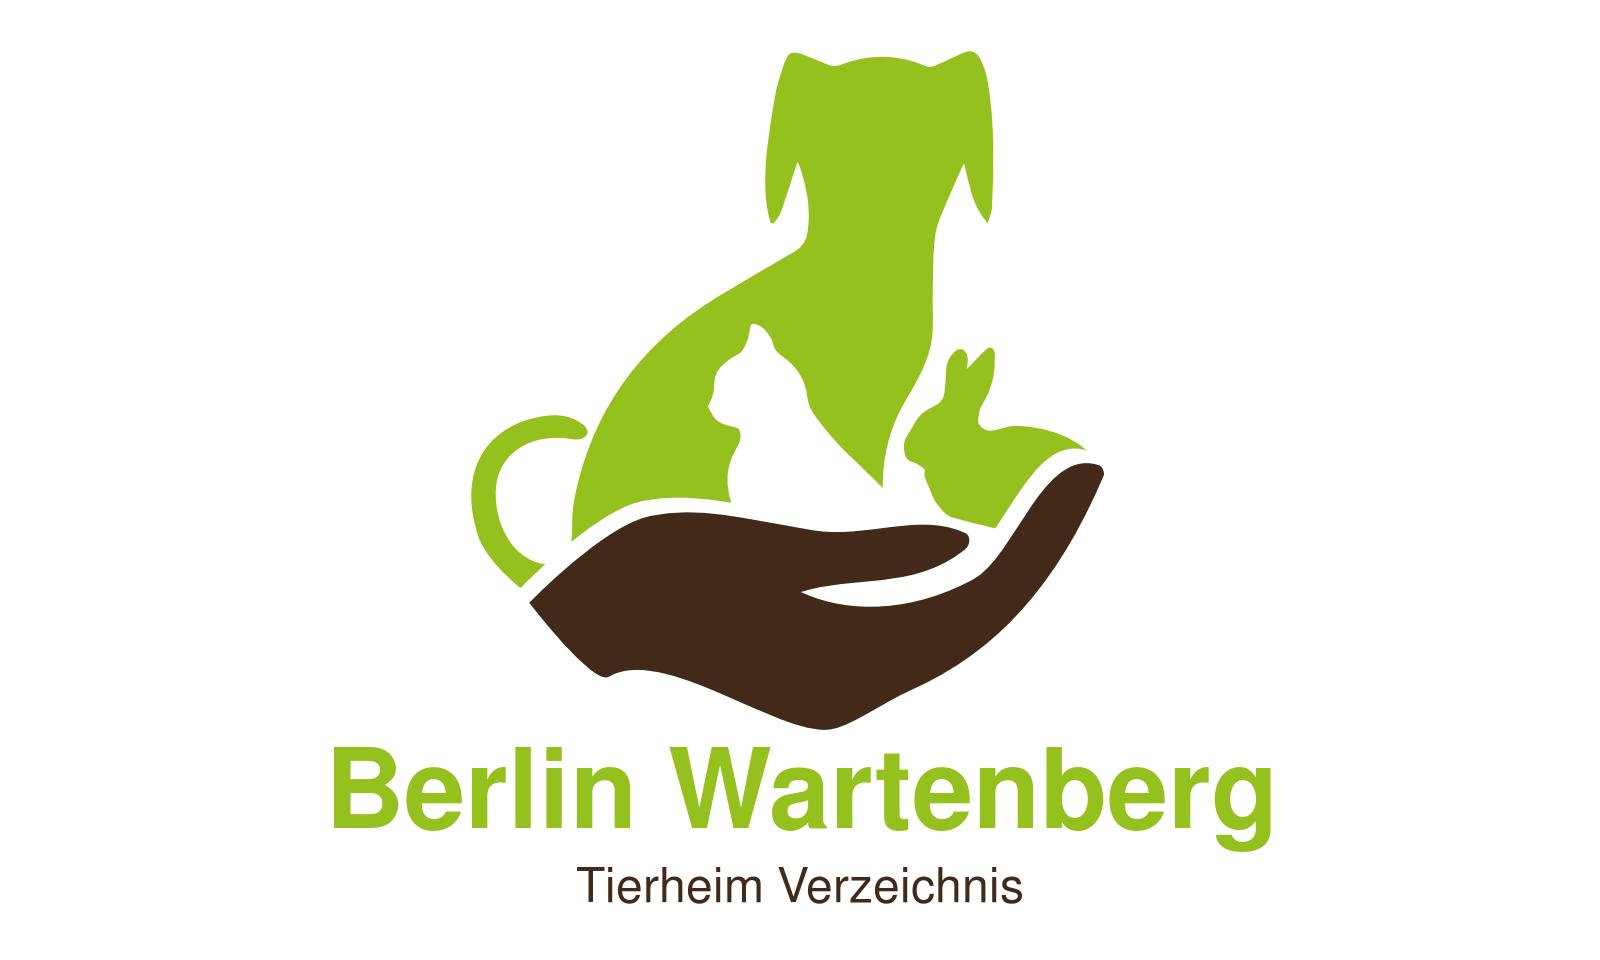 Tierheim Berlin Wartenberg